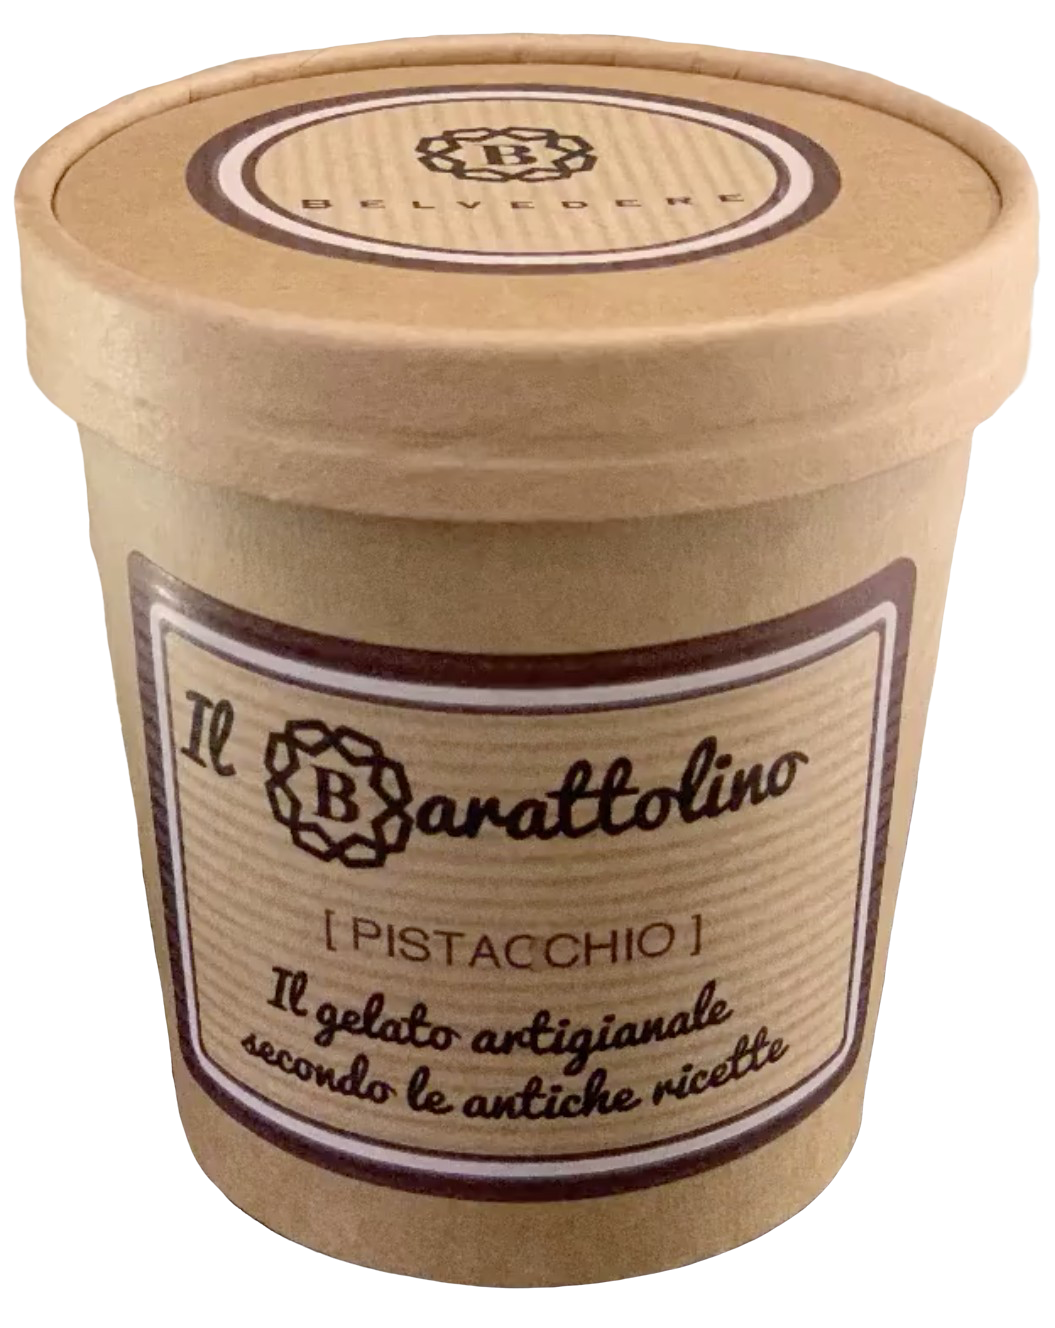 Barattolino Belvedere